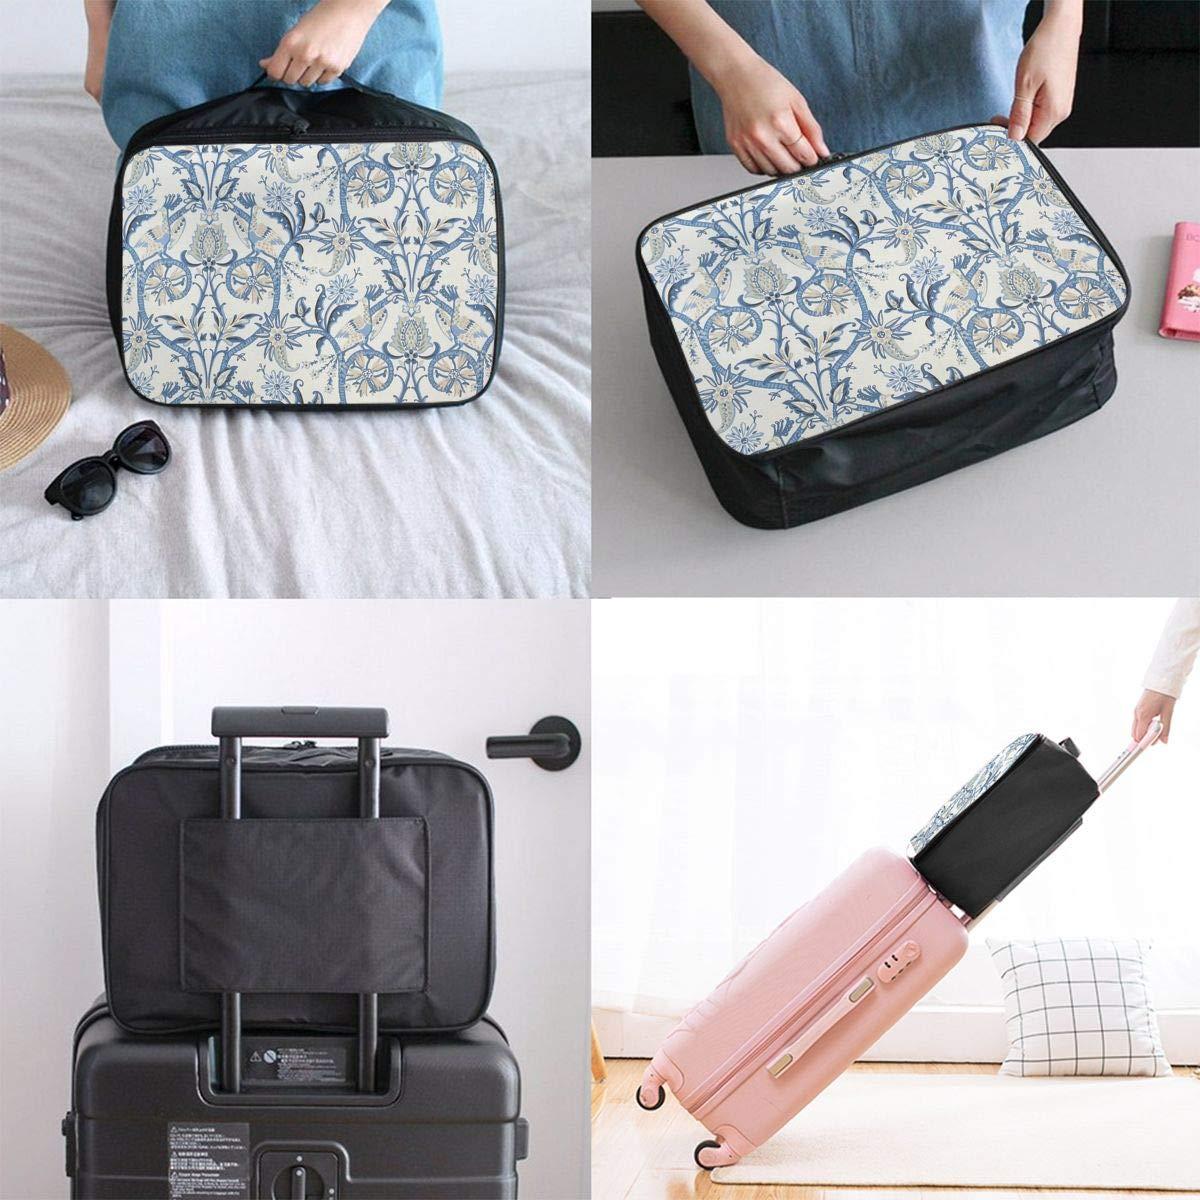 Travel Luggage Duffle Bag Lightweight Portable Handbag Peacock Print Large Capacity Waterproof Foldable Storage Tote